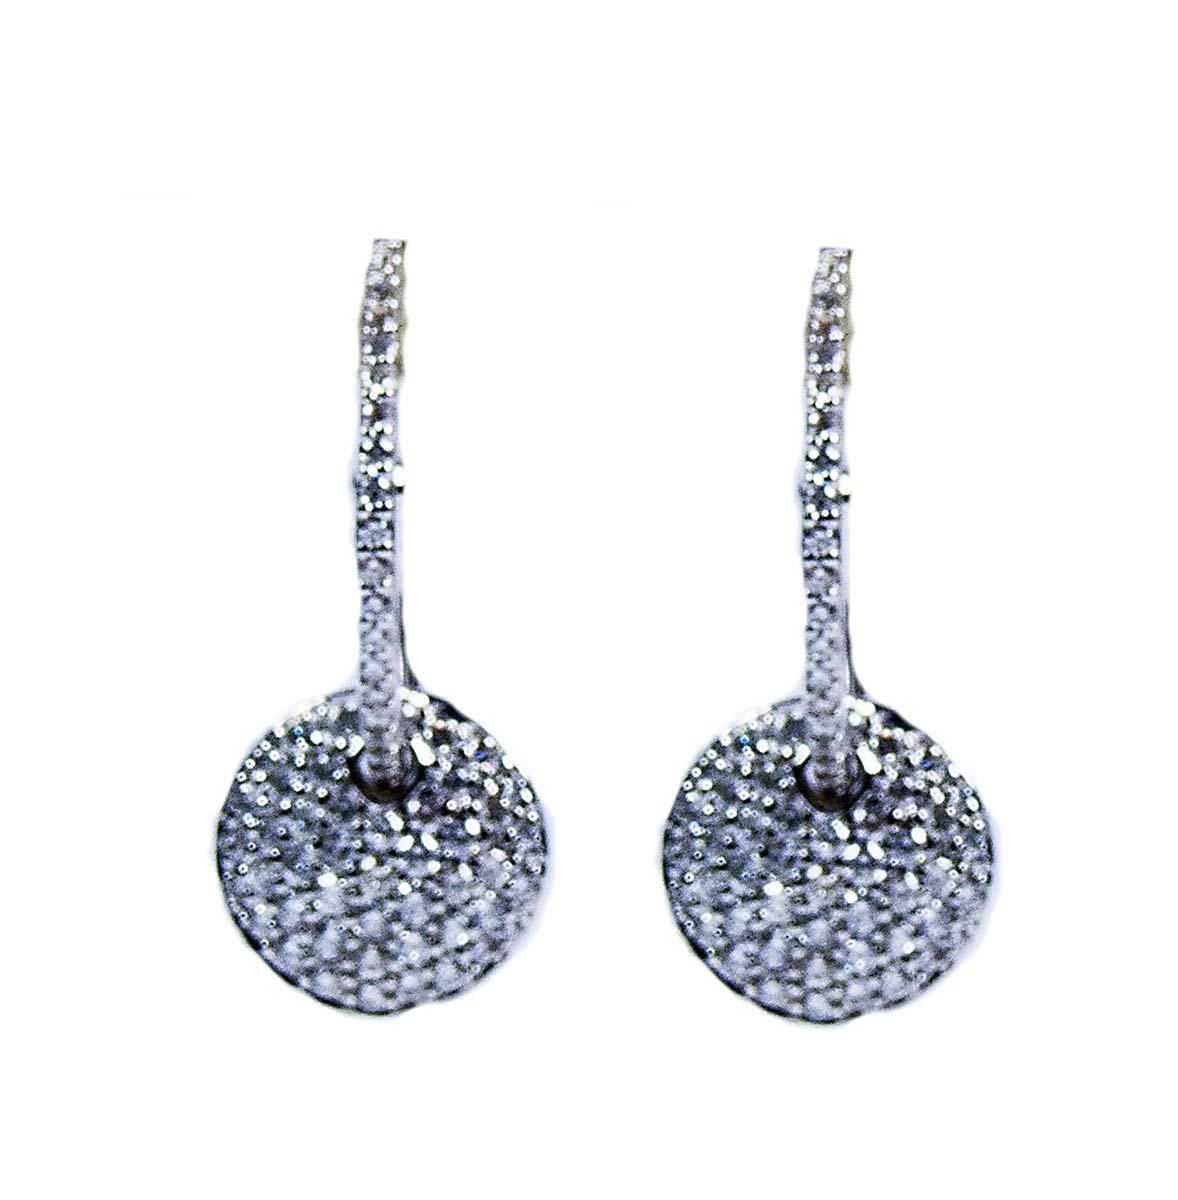 18kt diamond circle drop earrings